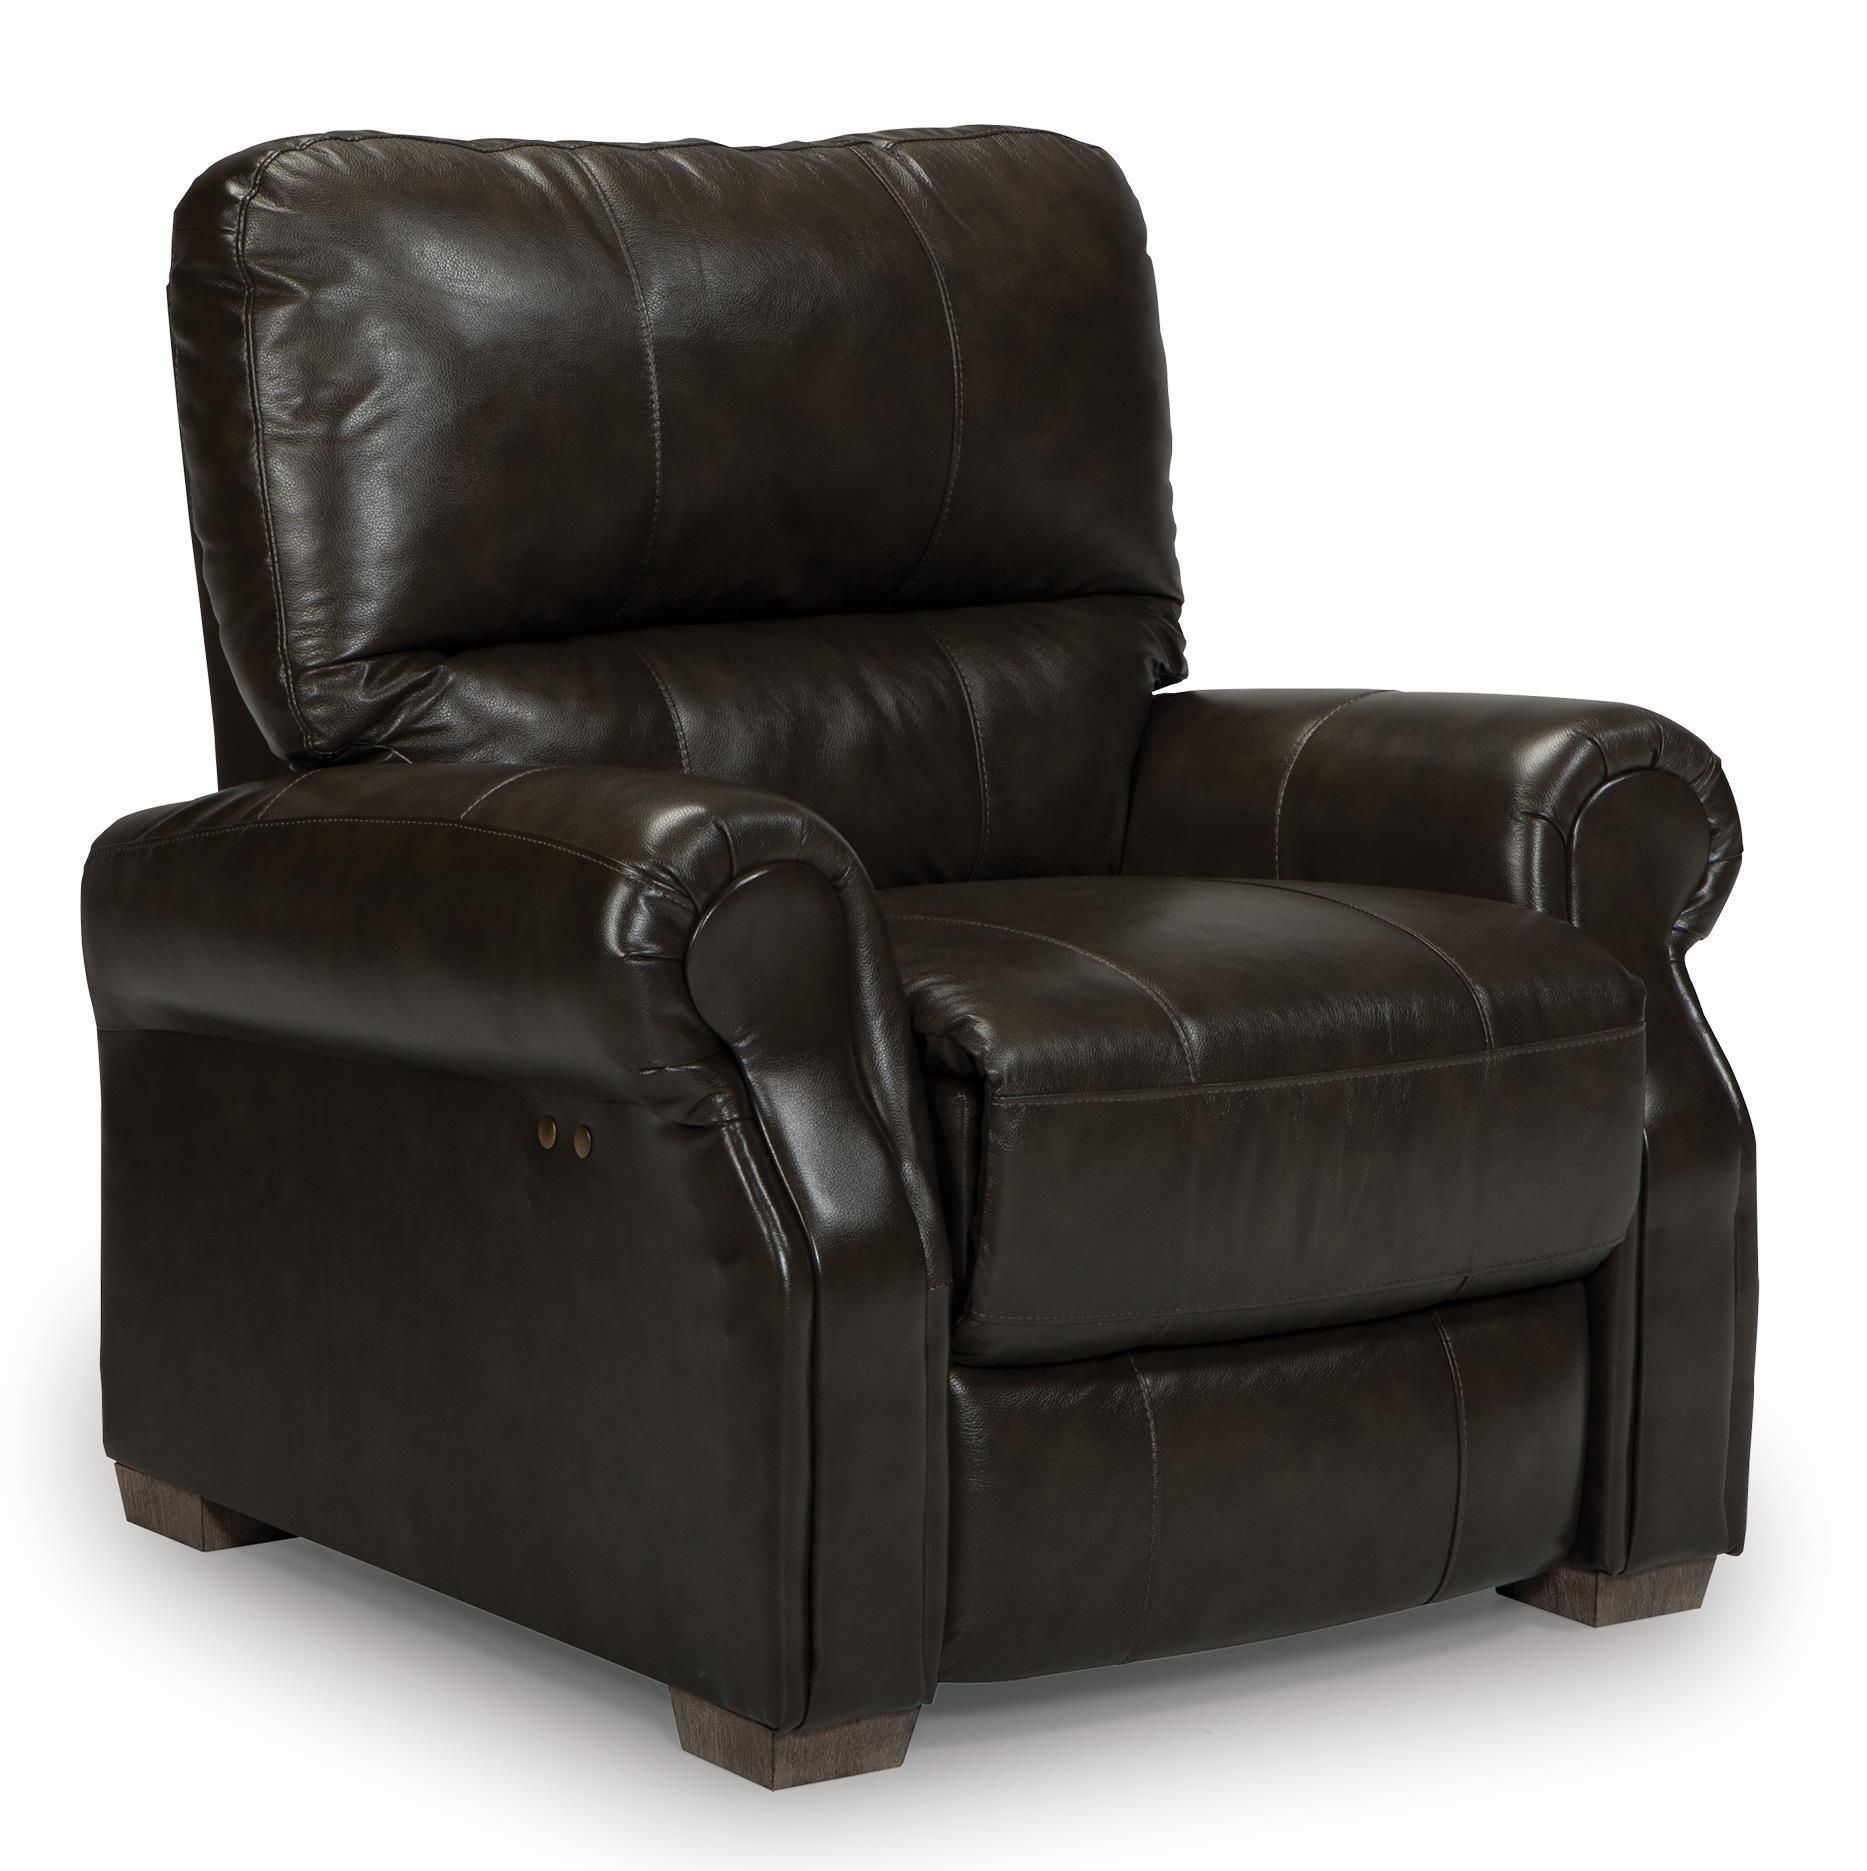 Best Home Furnishings Damien Power High Leg Recliner - Item Number: S910CP2-73106LV